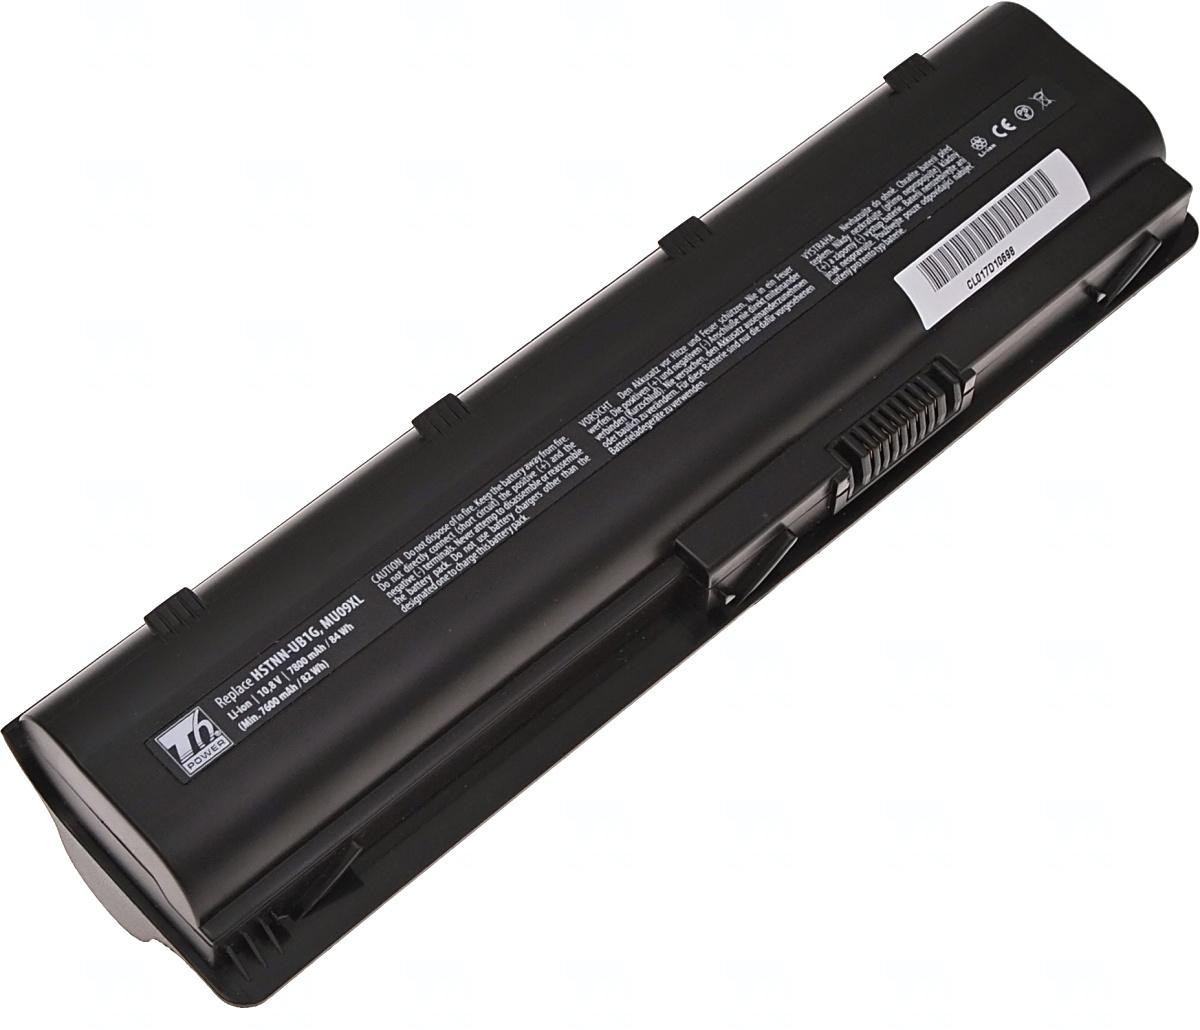 Baterie T6 power 593554-001, 593562-001, 586007-541, 586006-741, 588178-141, HSTNN-CB0W, HSTNN-CB0X, MU09, WD549AA, HSTNN-Q62C, MU09XL